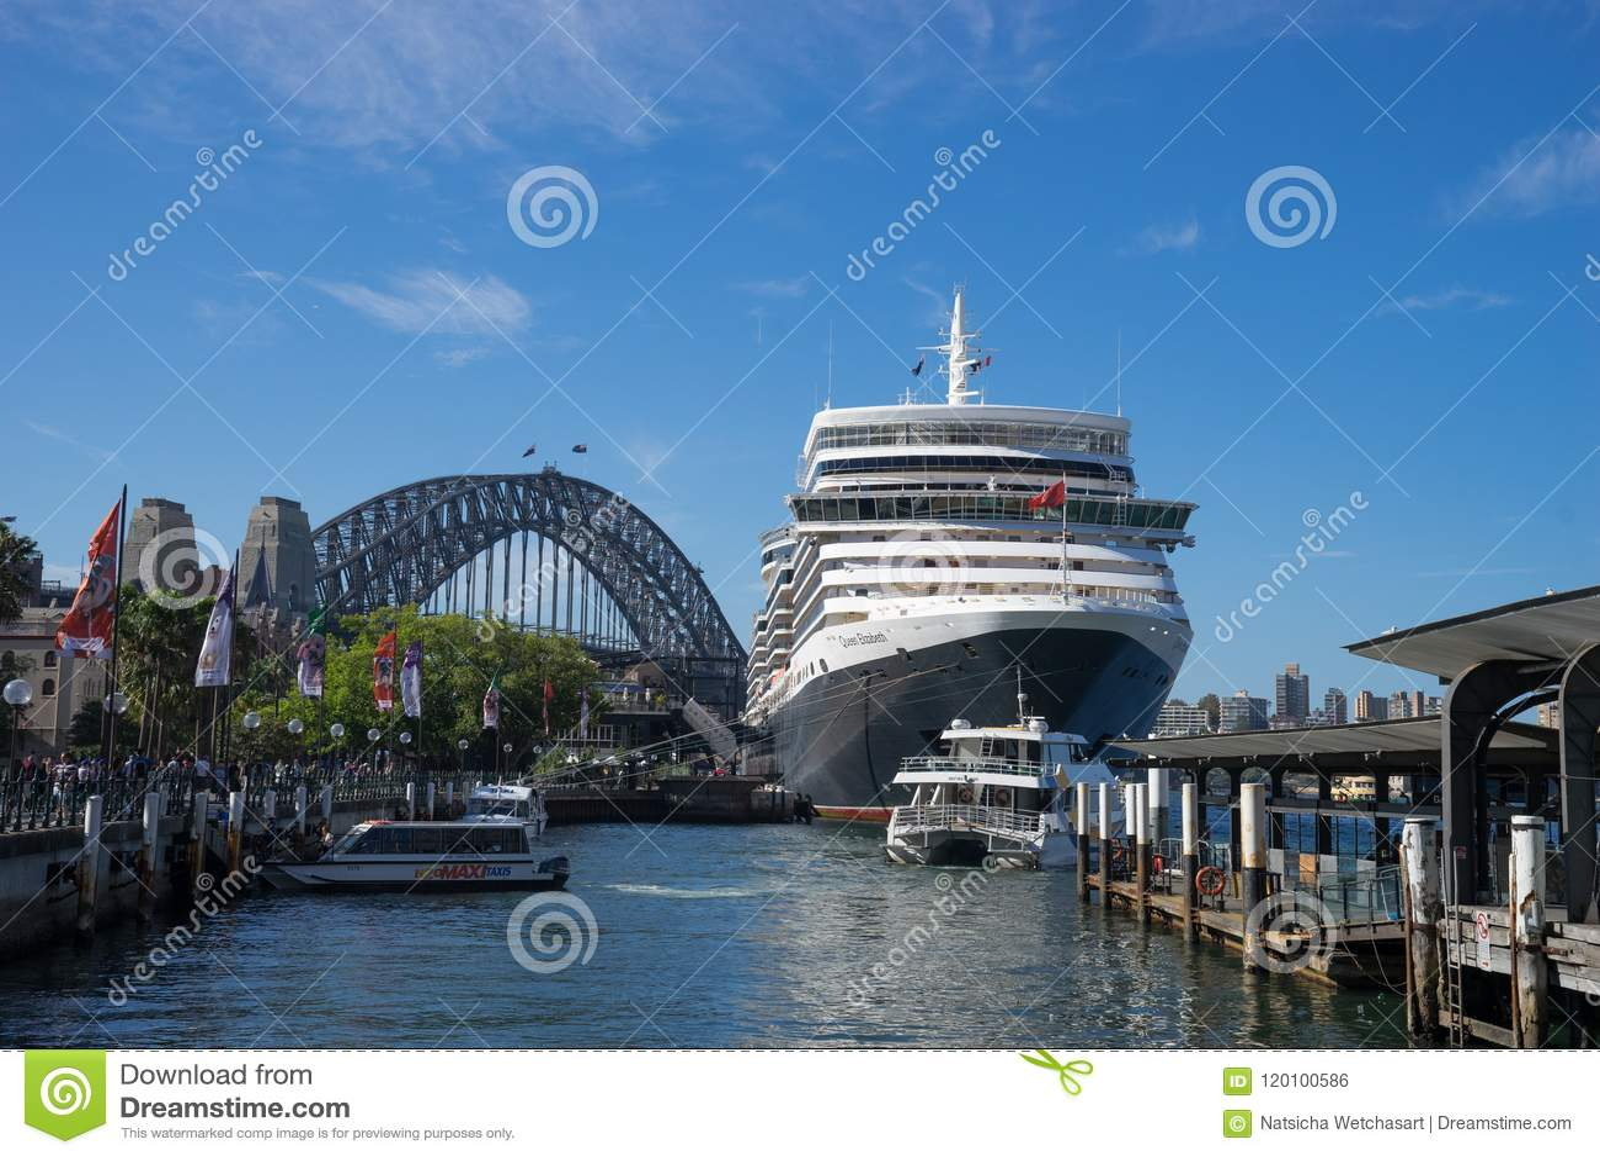 Close Up The World`s Famous Ship, Queen Elizabeth Cruise Ship Do